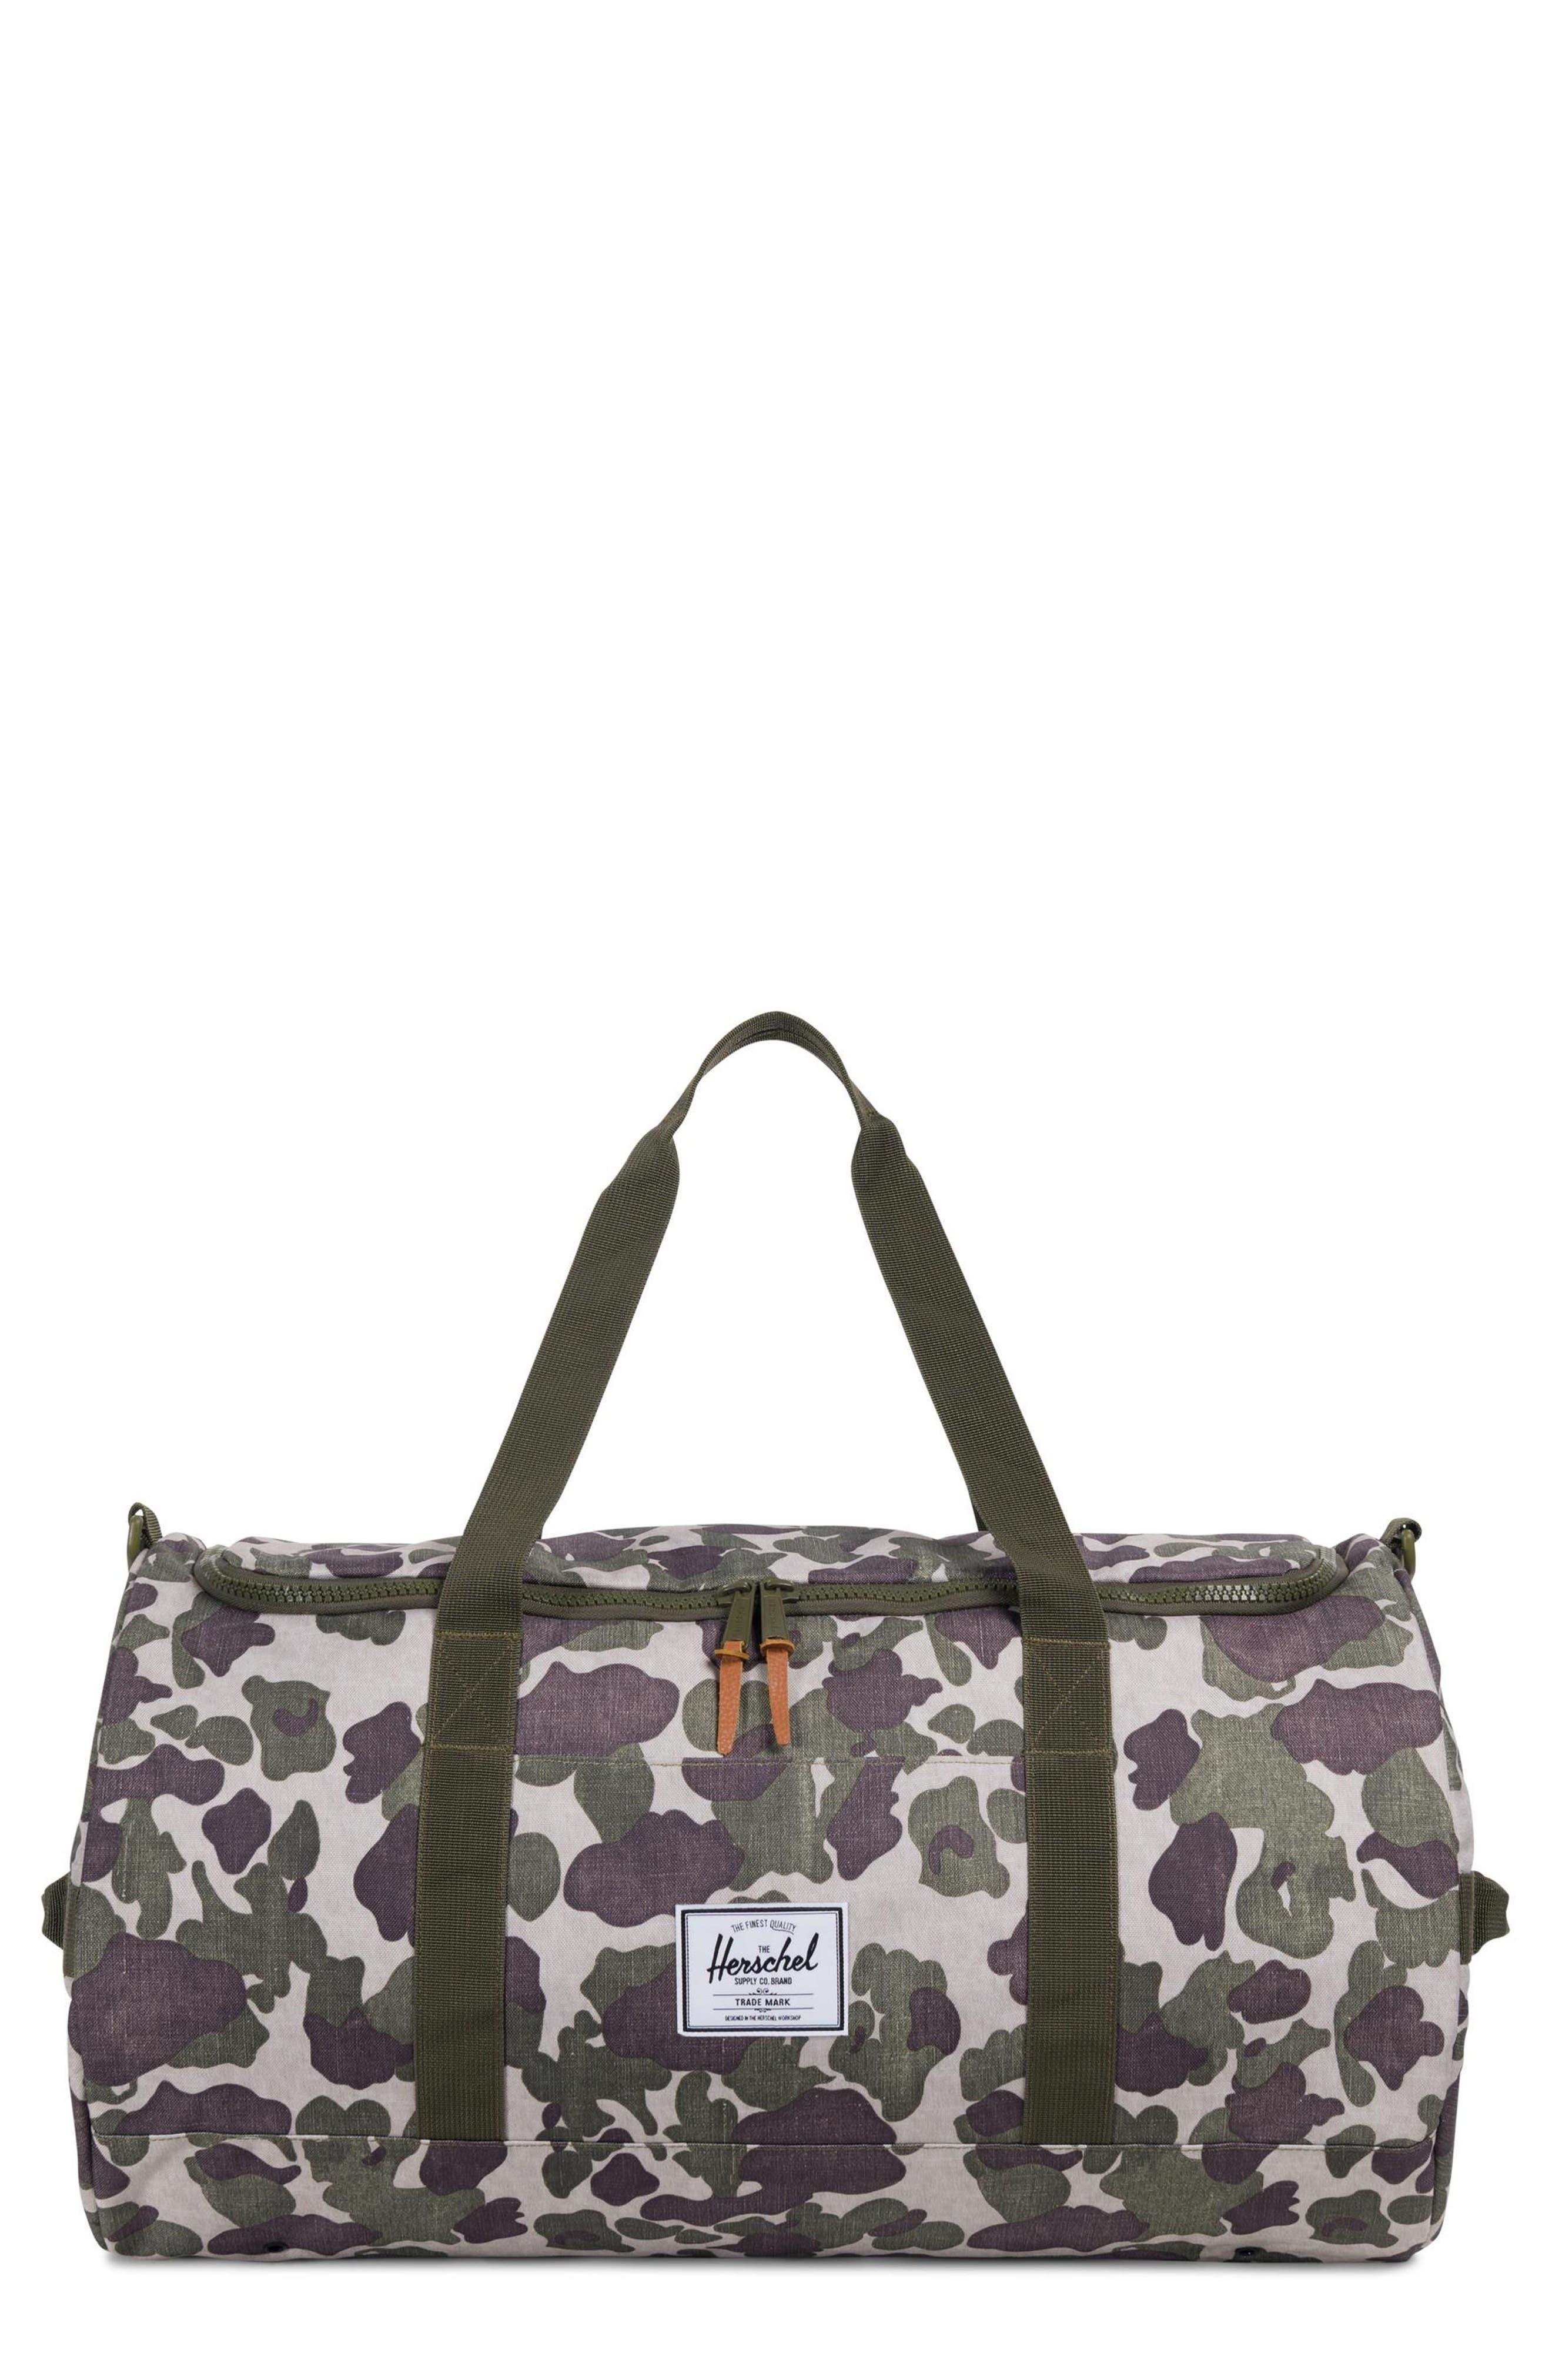 HERSCHEL SUPPLY CO. Sutton Duffel Bag, Main, color, 310